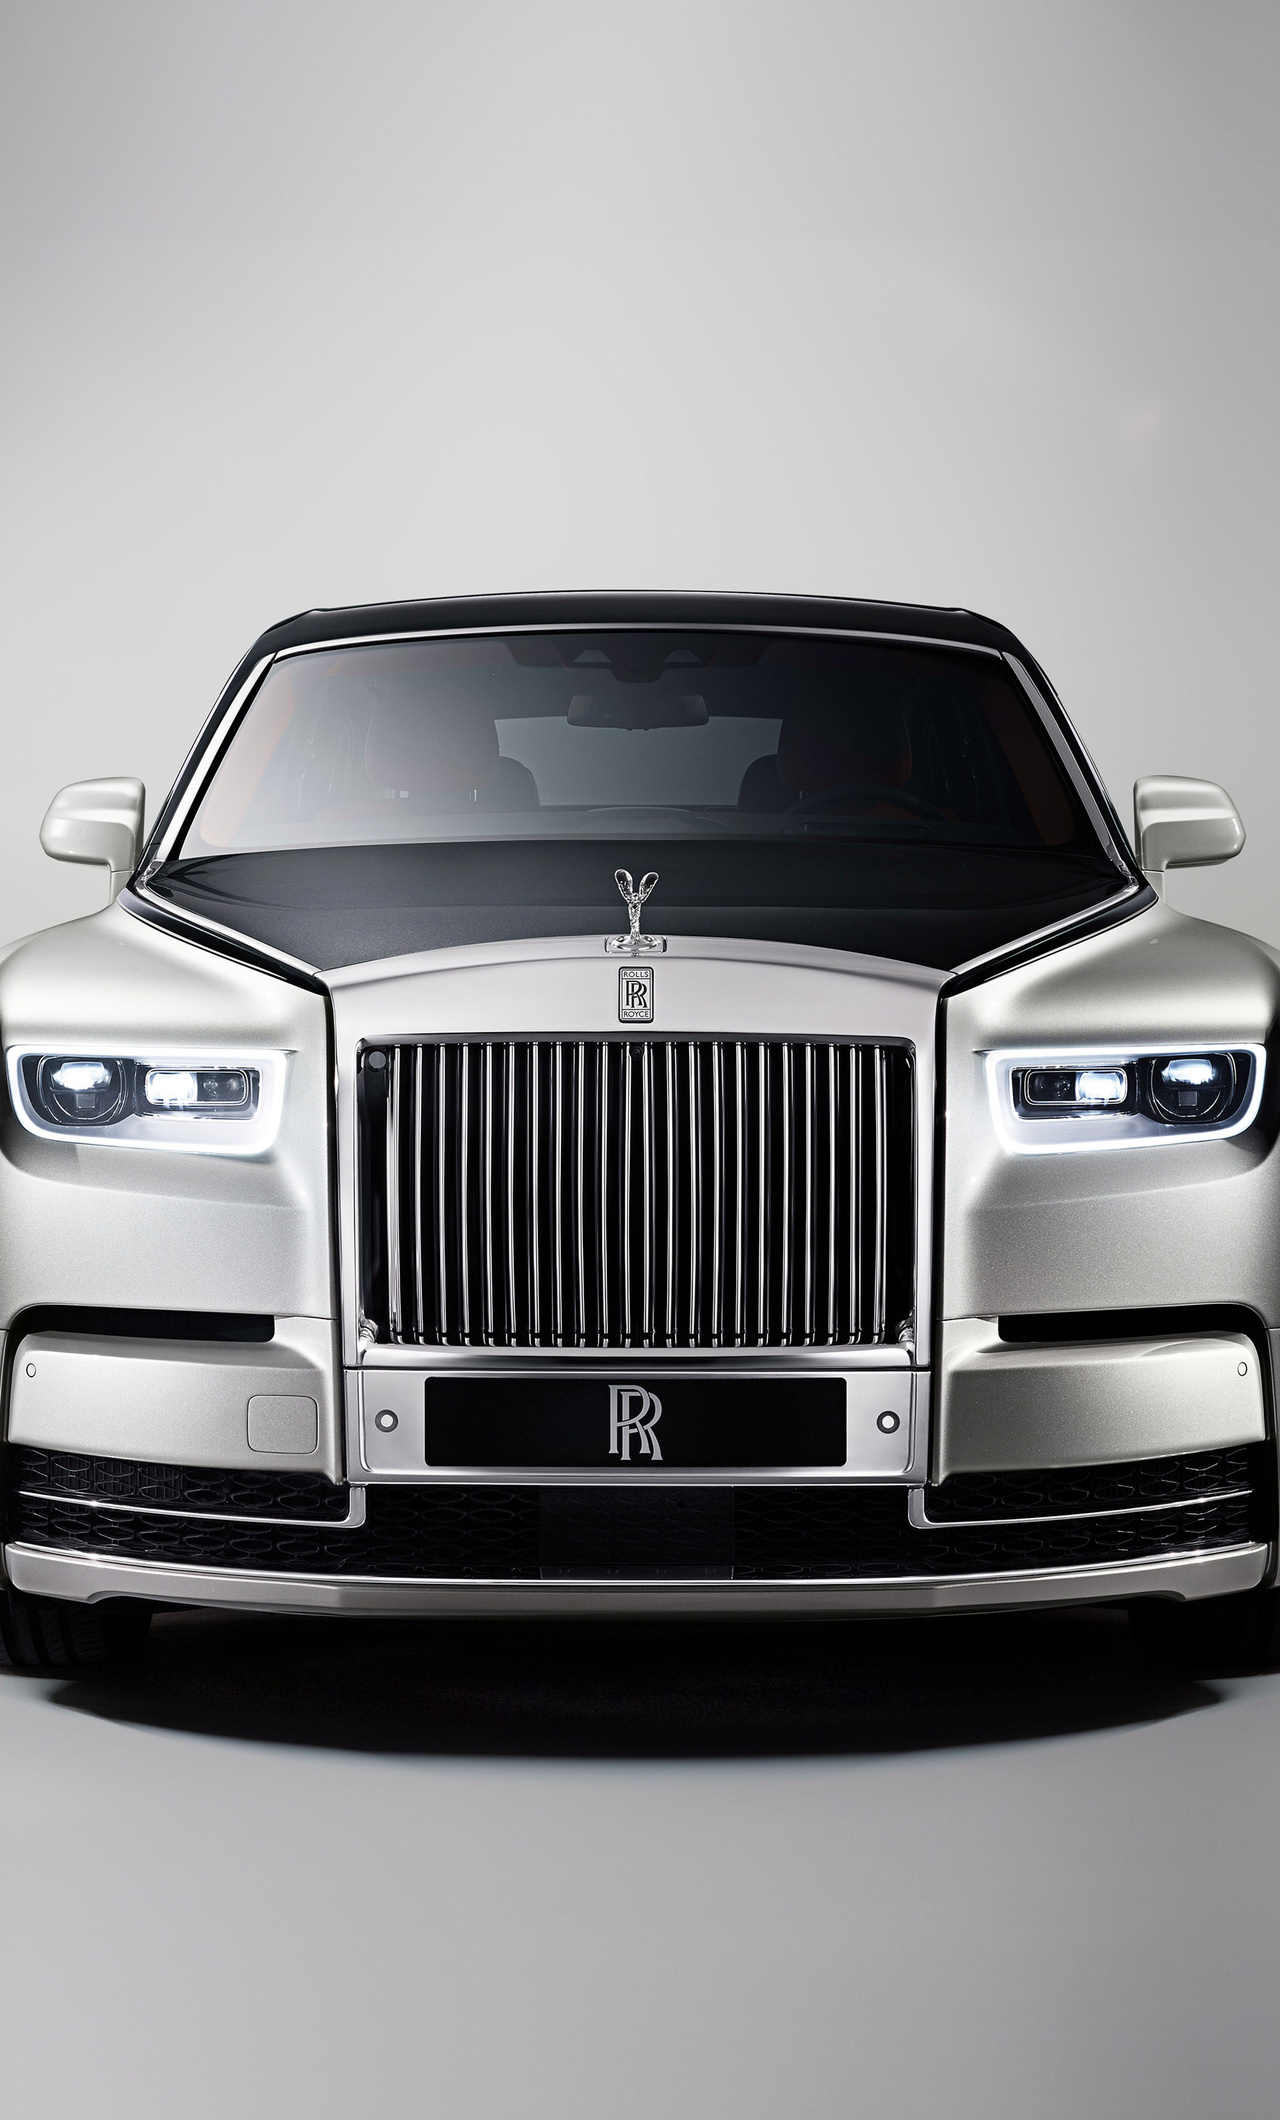 1280x2120 Rolls Royce Phantom 2017 Iphone 6 Hd 4k Wallpapers